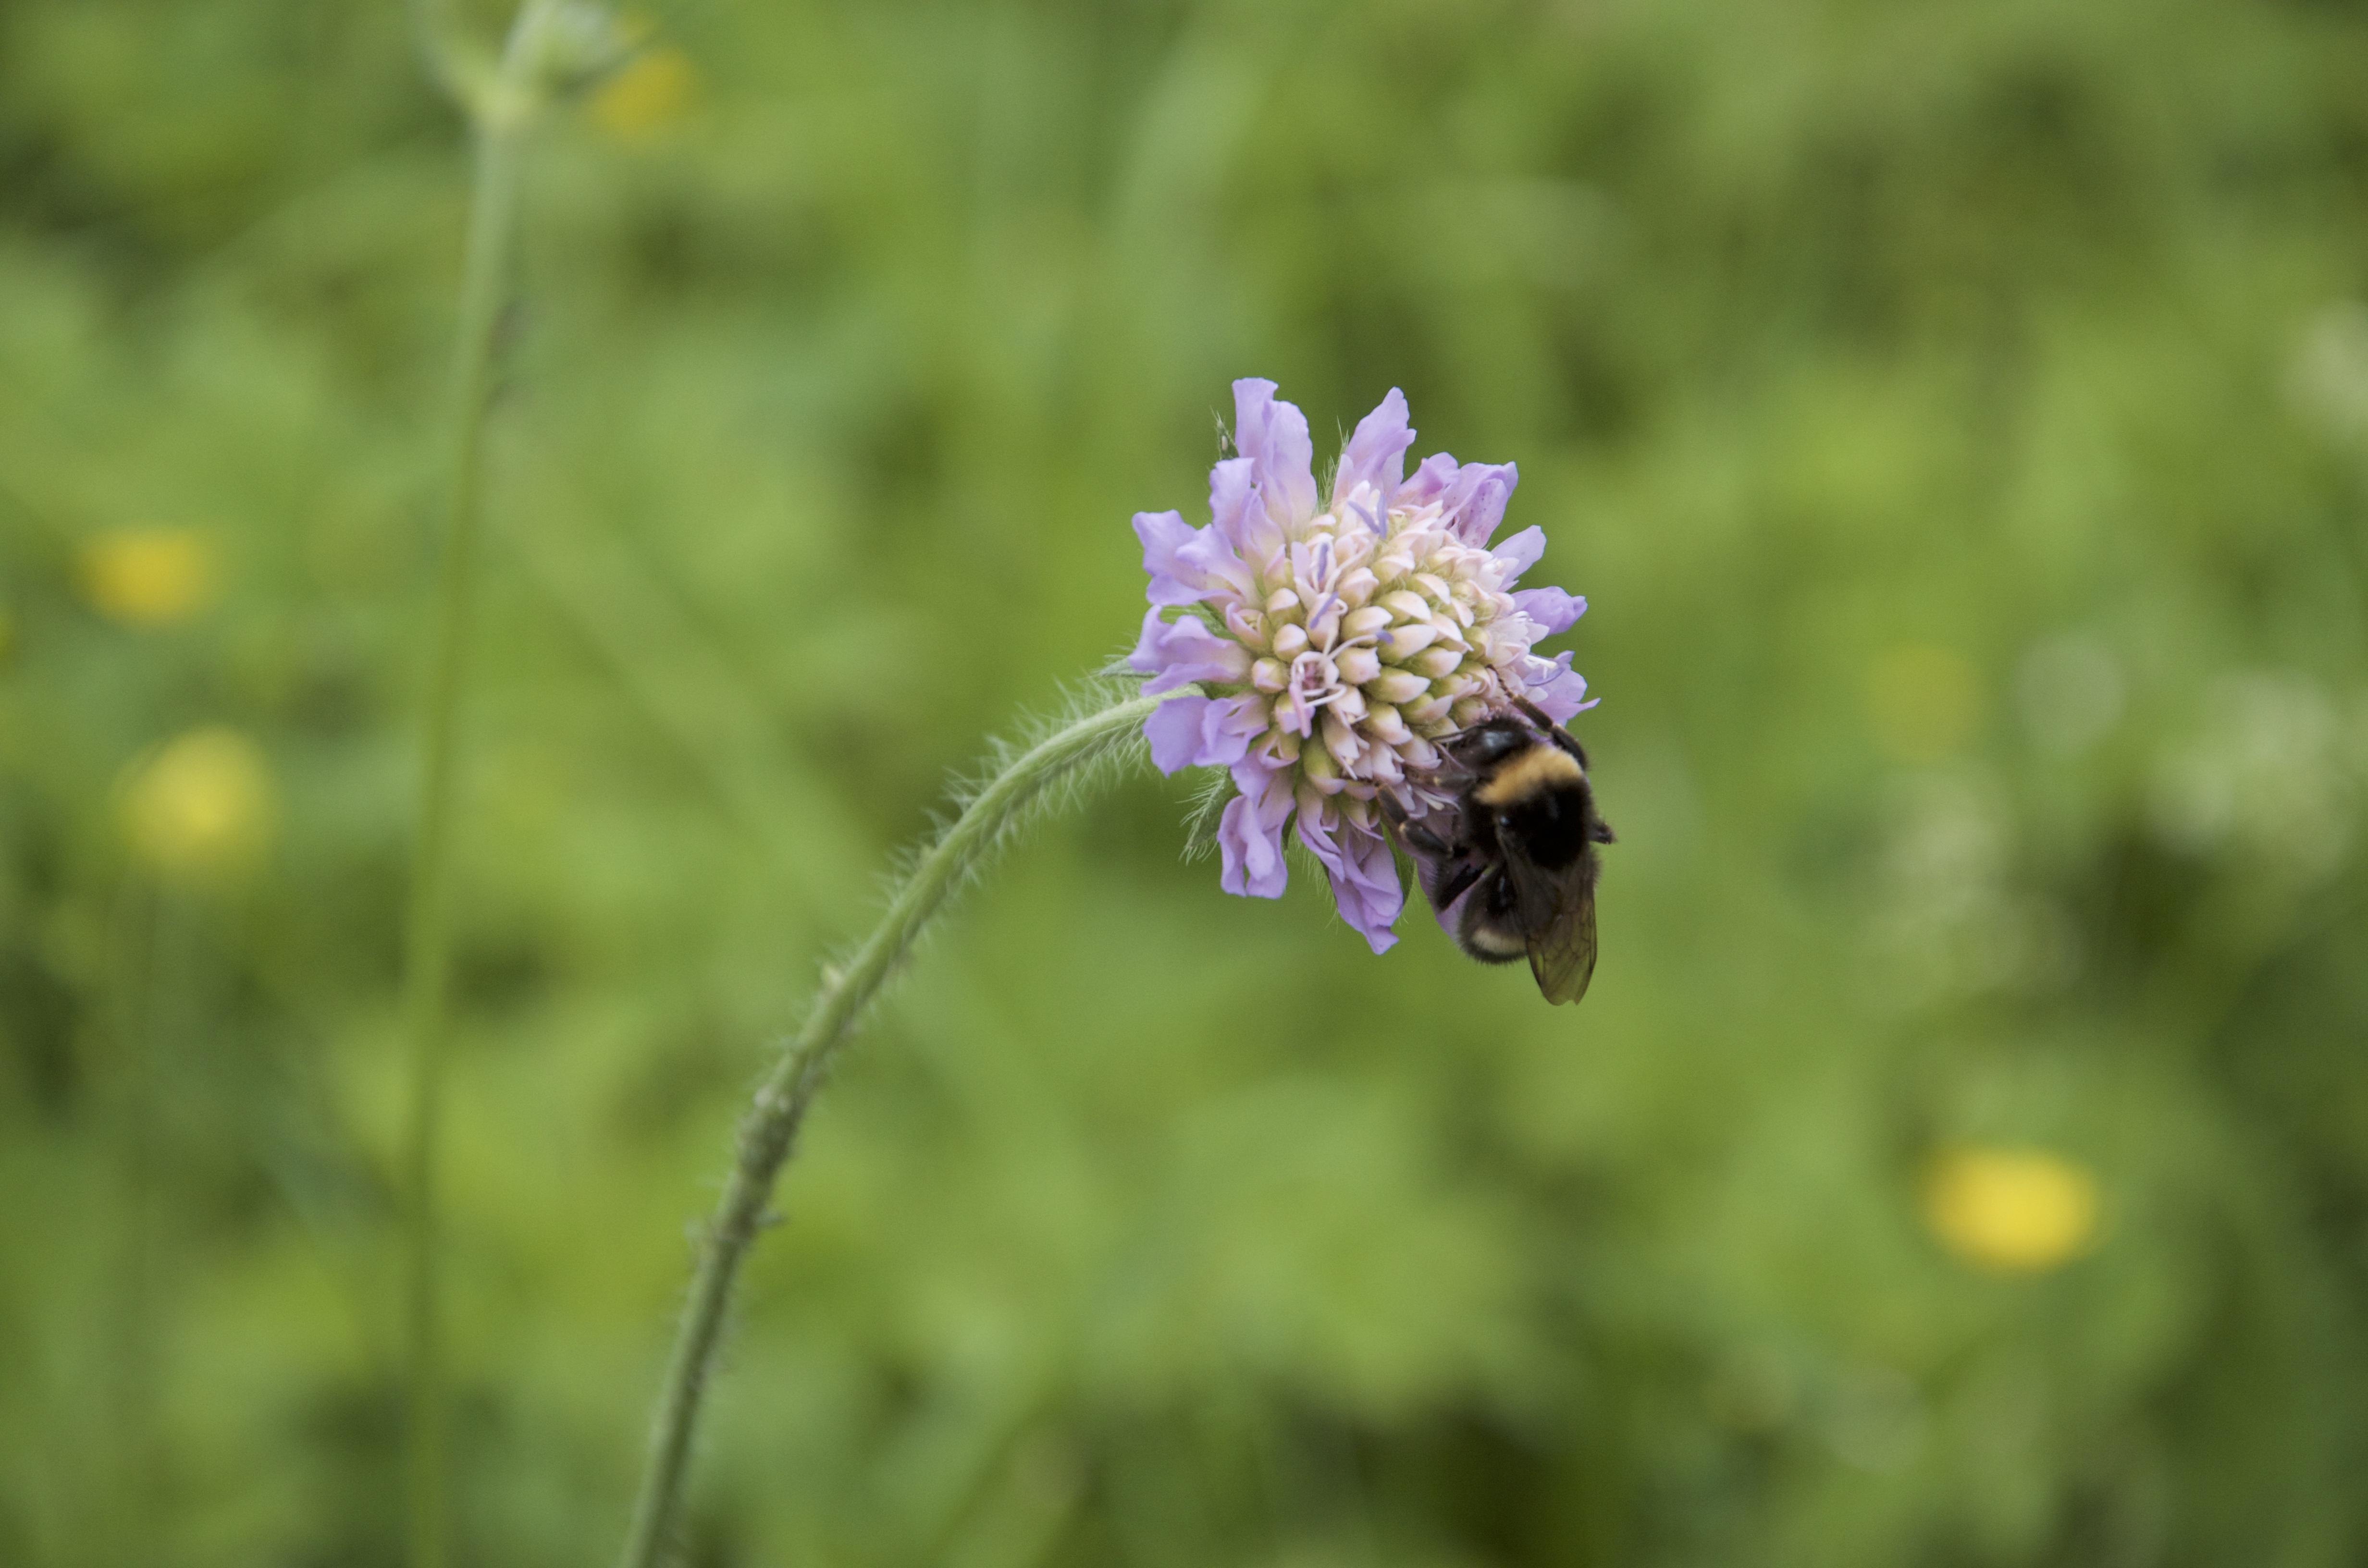 Fotos gratis naturaleza prado pradera polen insecto - Plantas para ahuyentar insectos ...